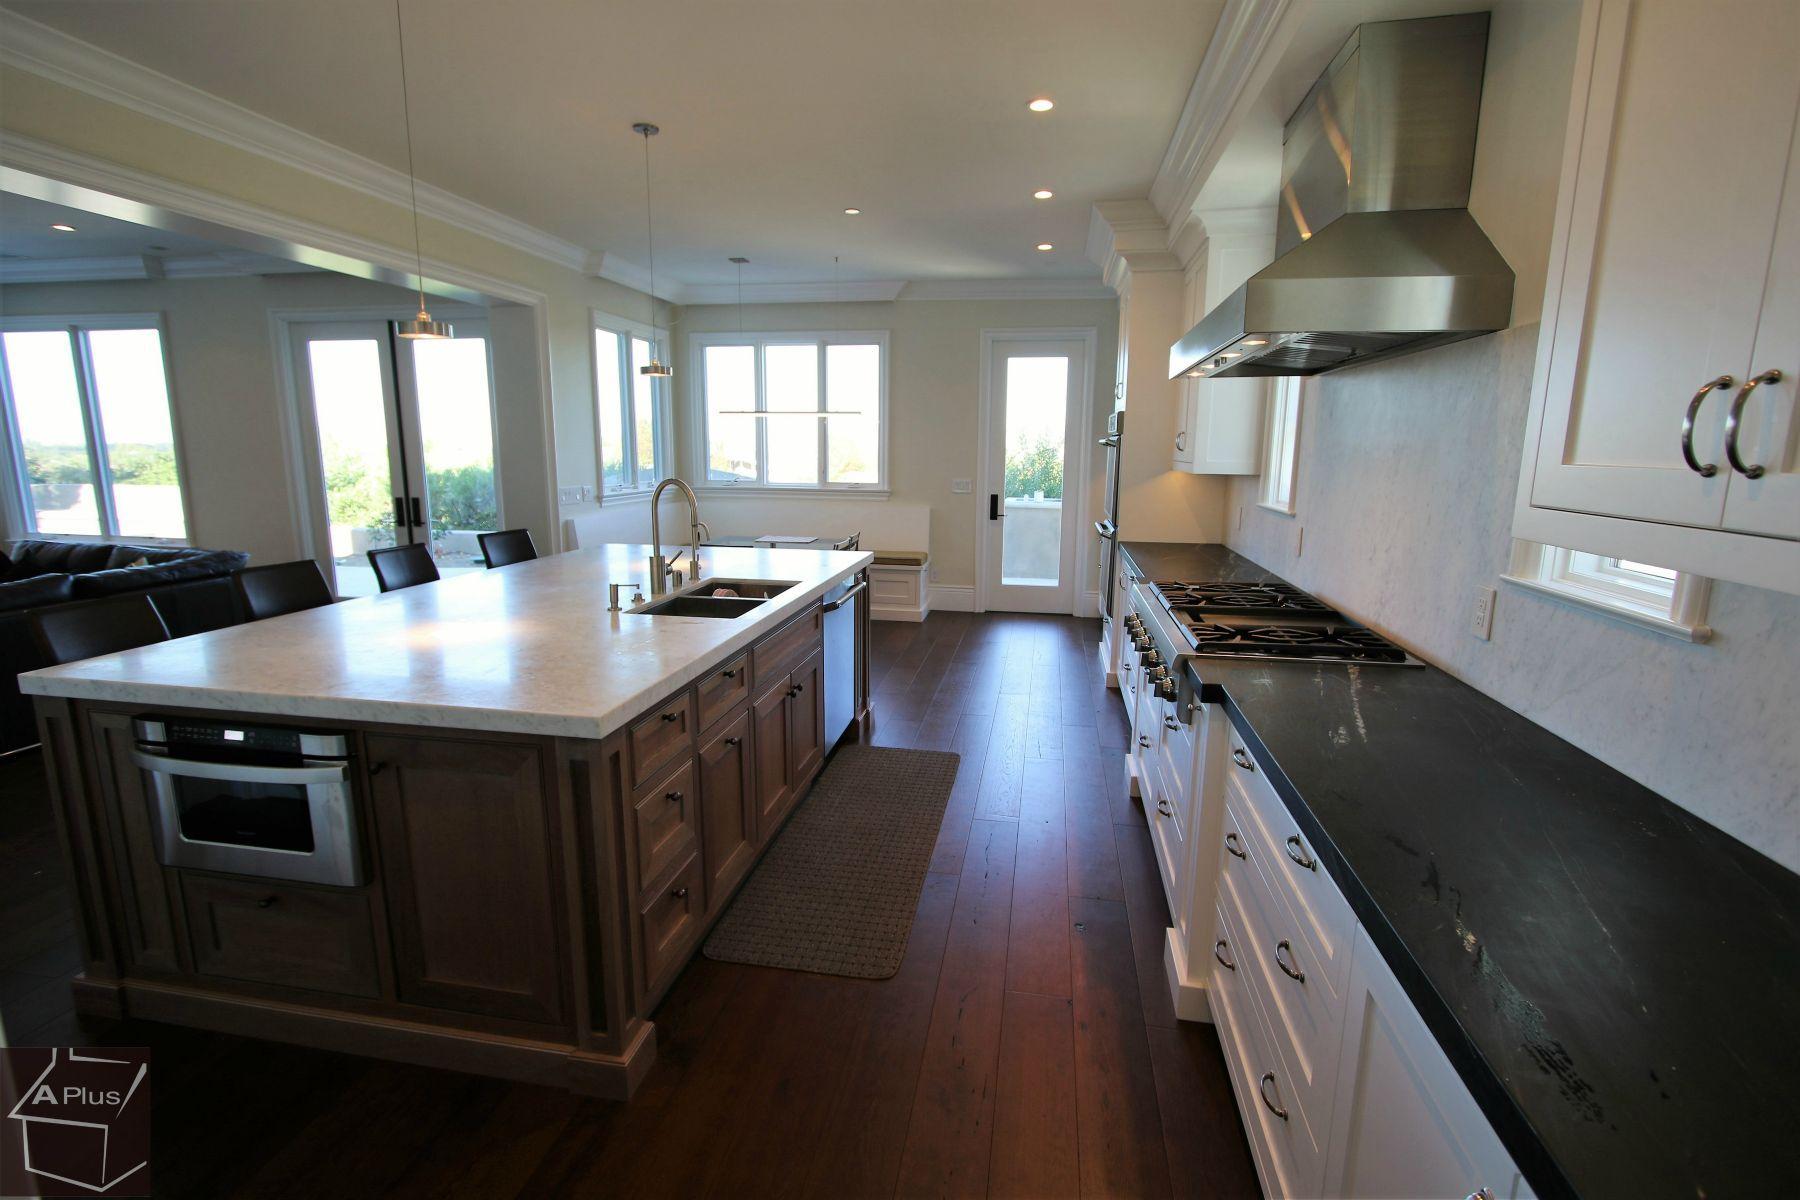 Aplus Interior Design Remodeling Kitchen Remodel Contemporary